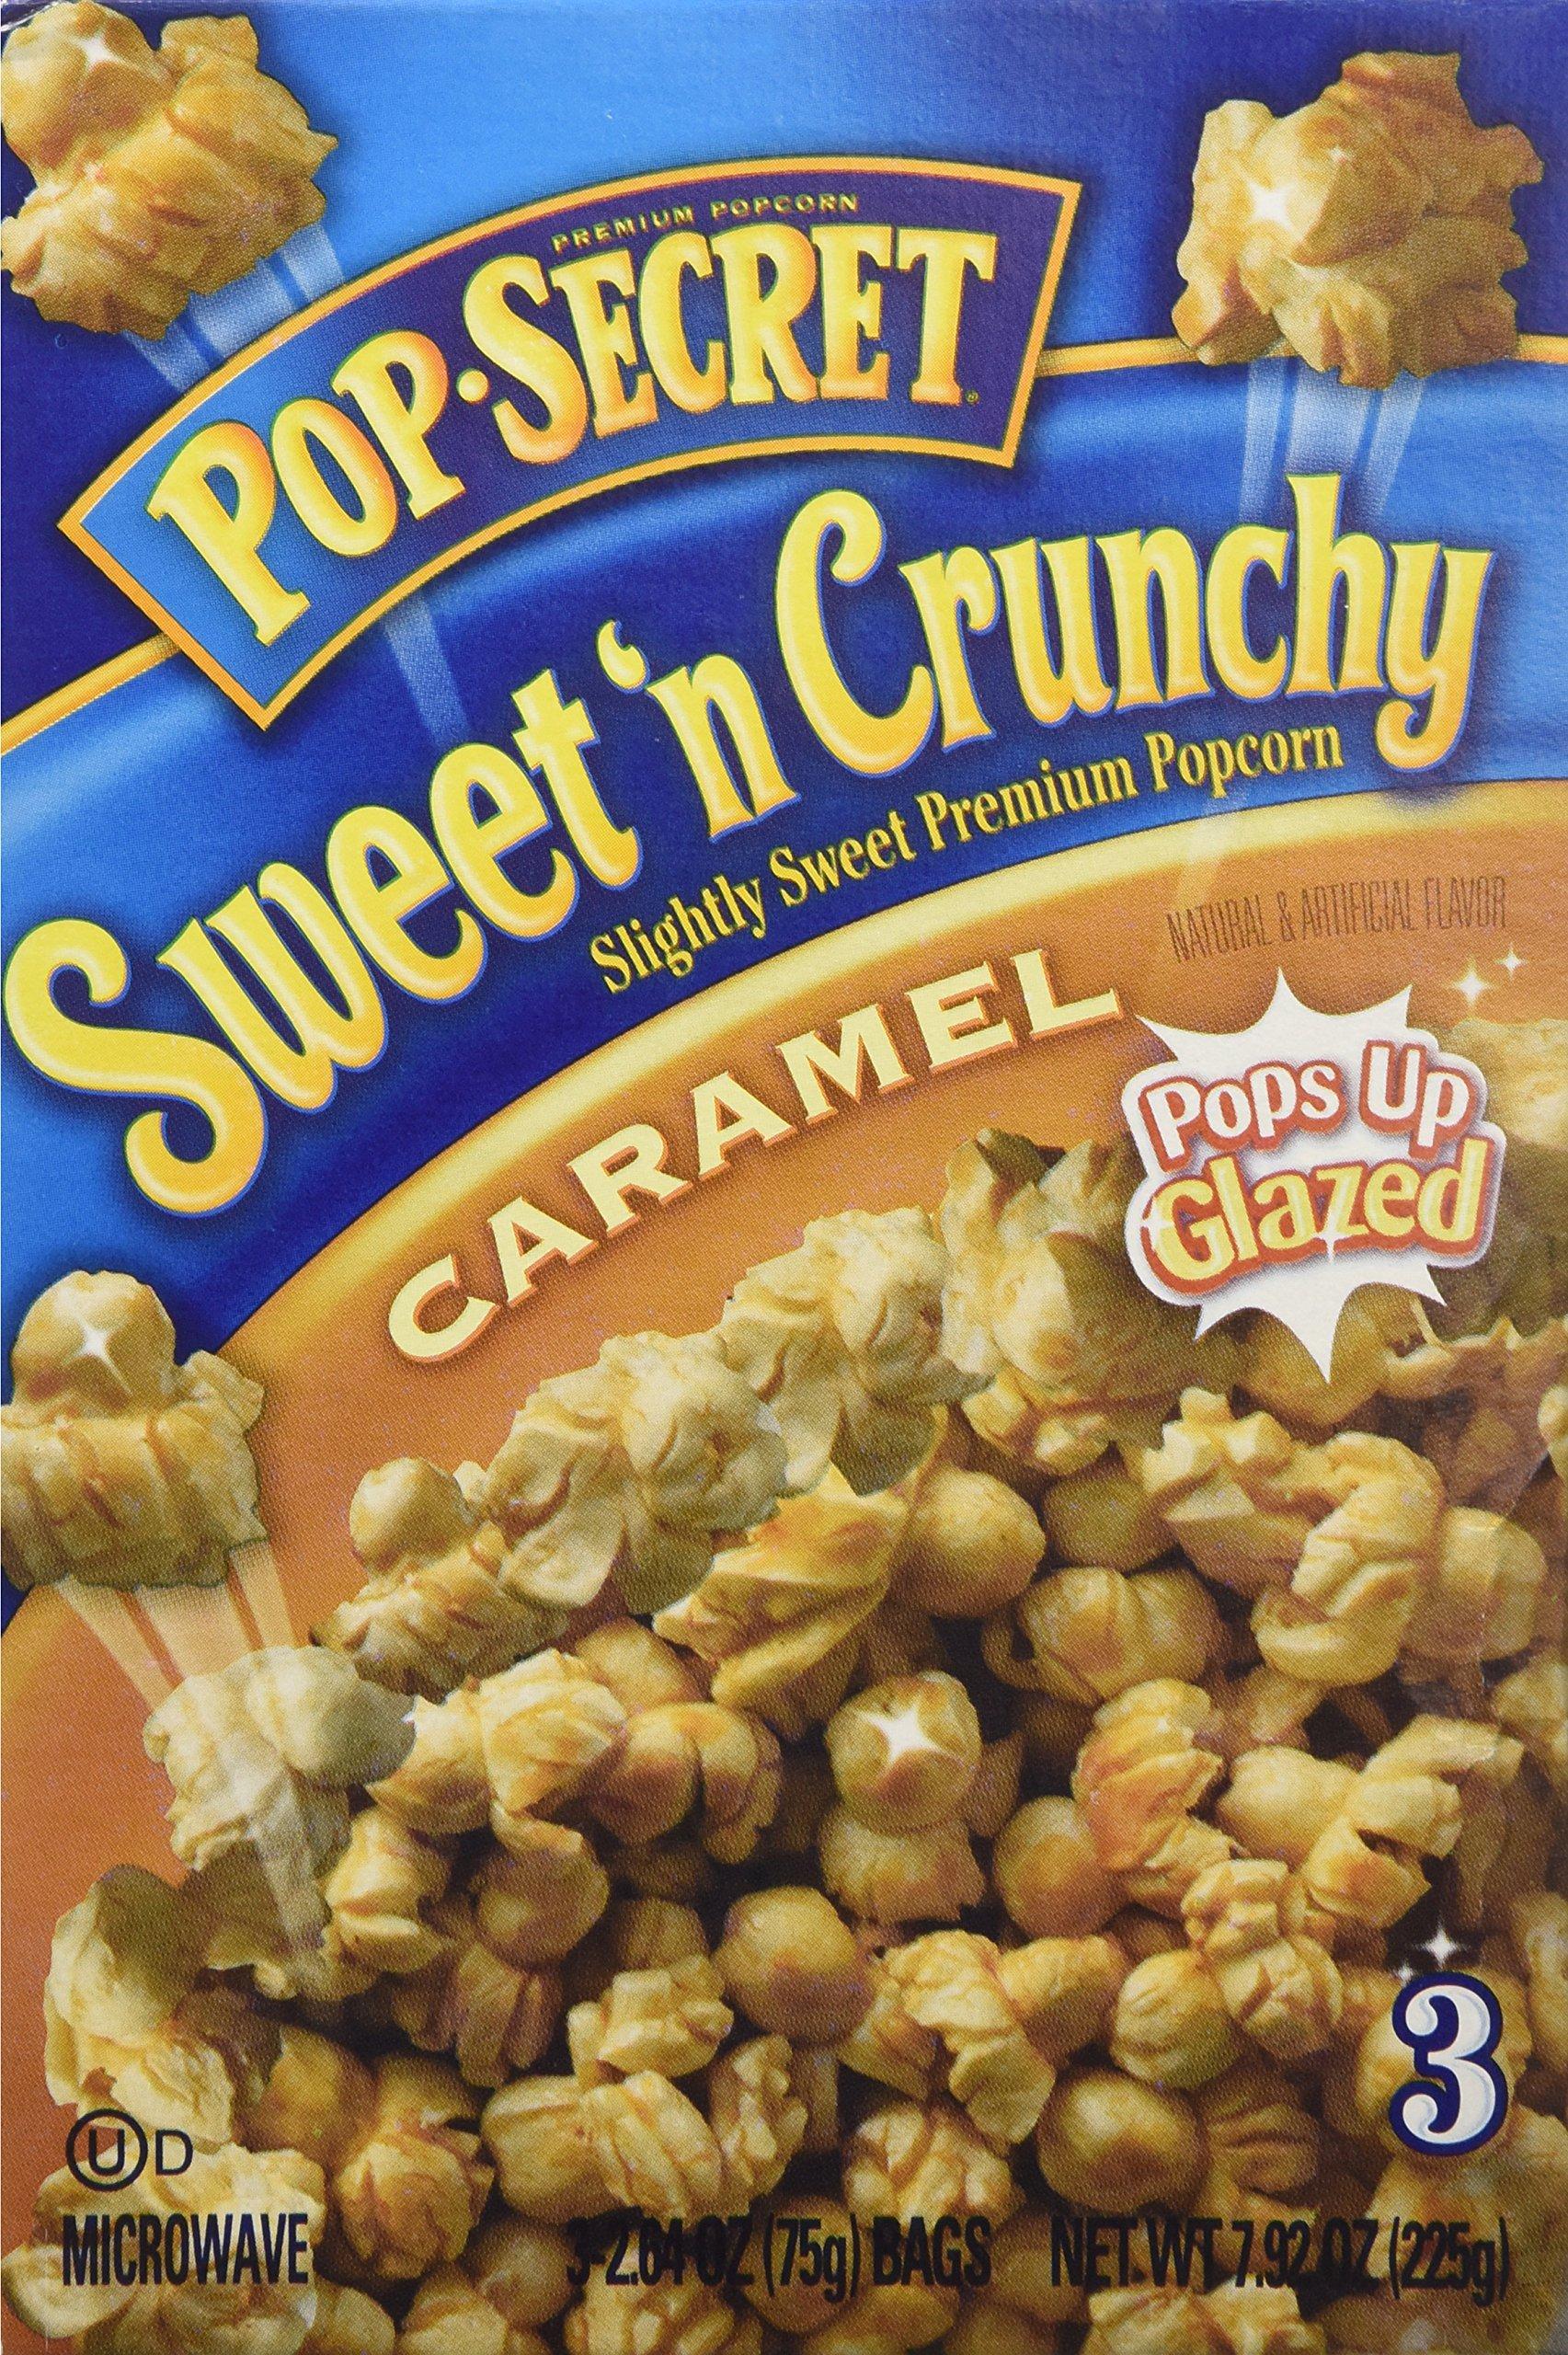 Pop-Secret Sweet 'N Crunchy Caramel Popcorn, 3 Bag Count/Box